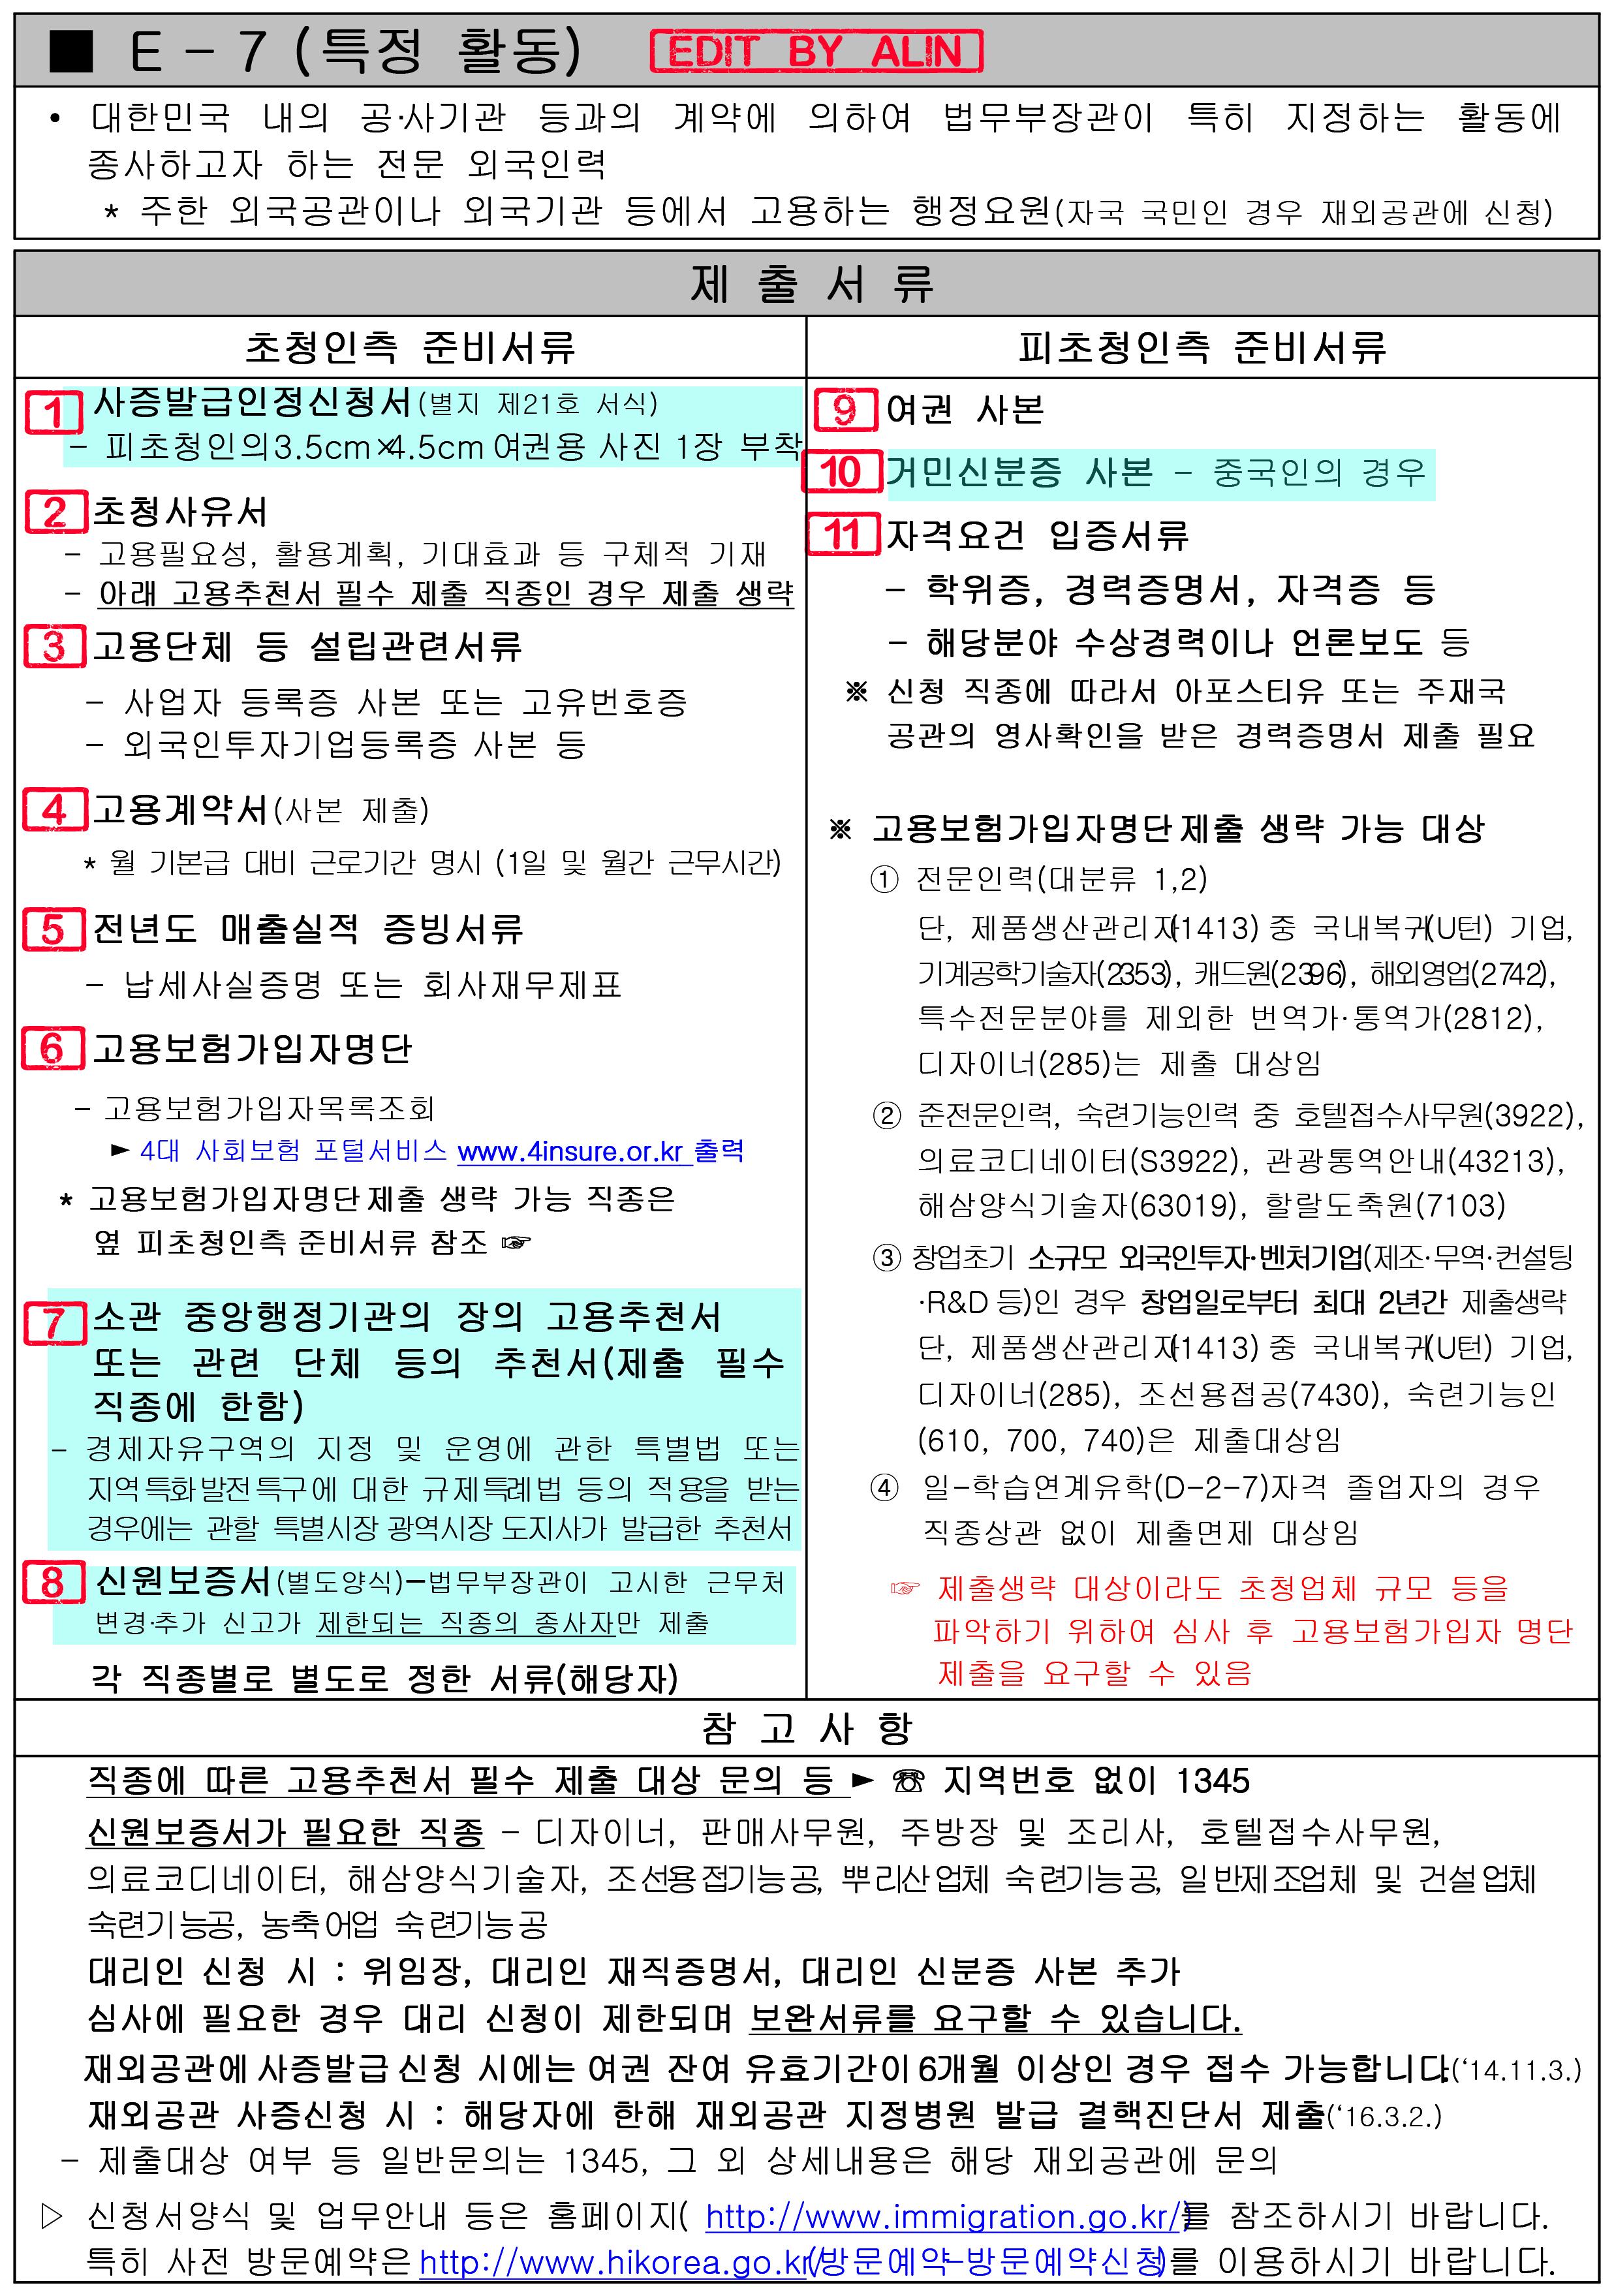 『韓國工作簽證E7』 資料準備篇(一) – ALin's Wonderland